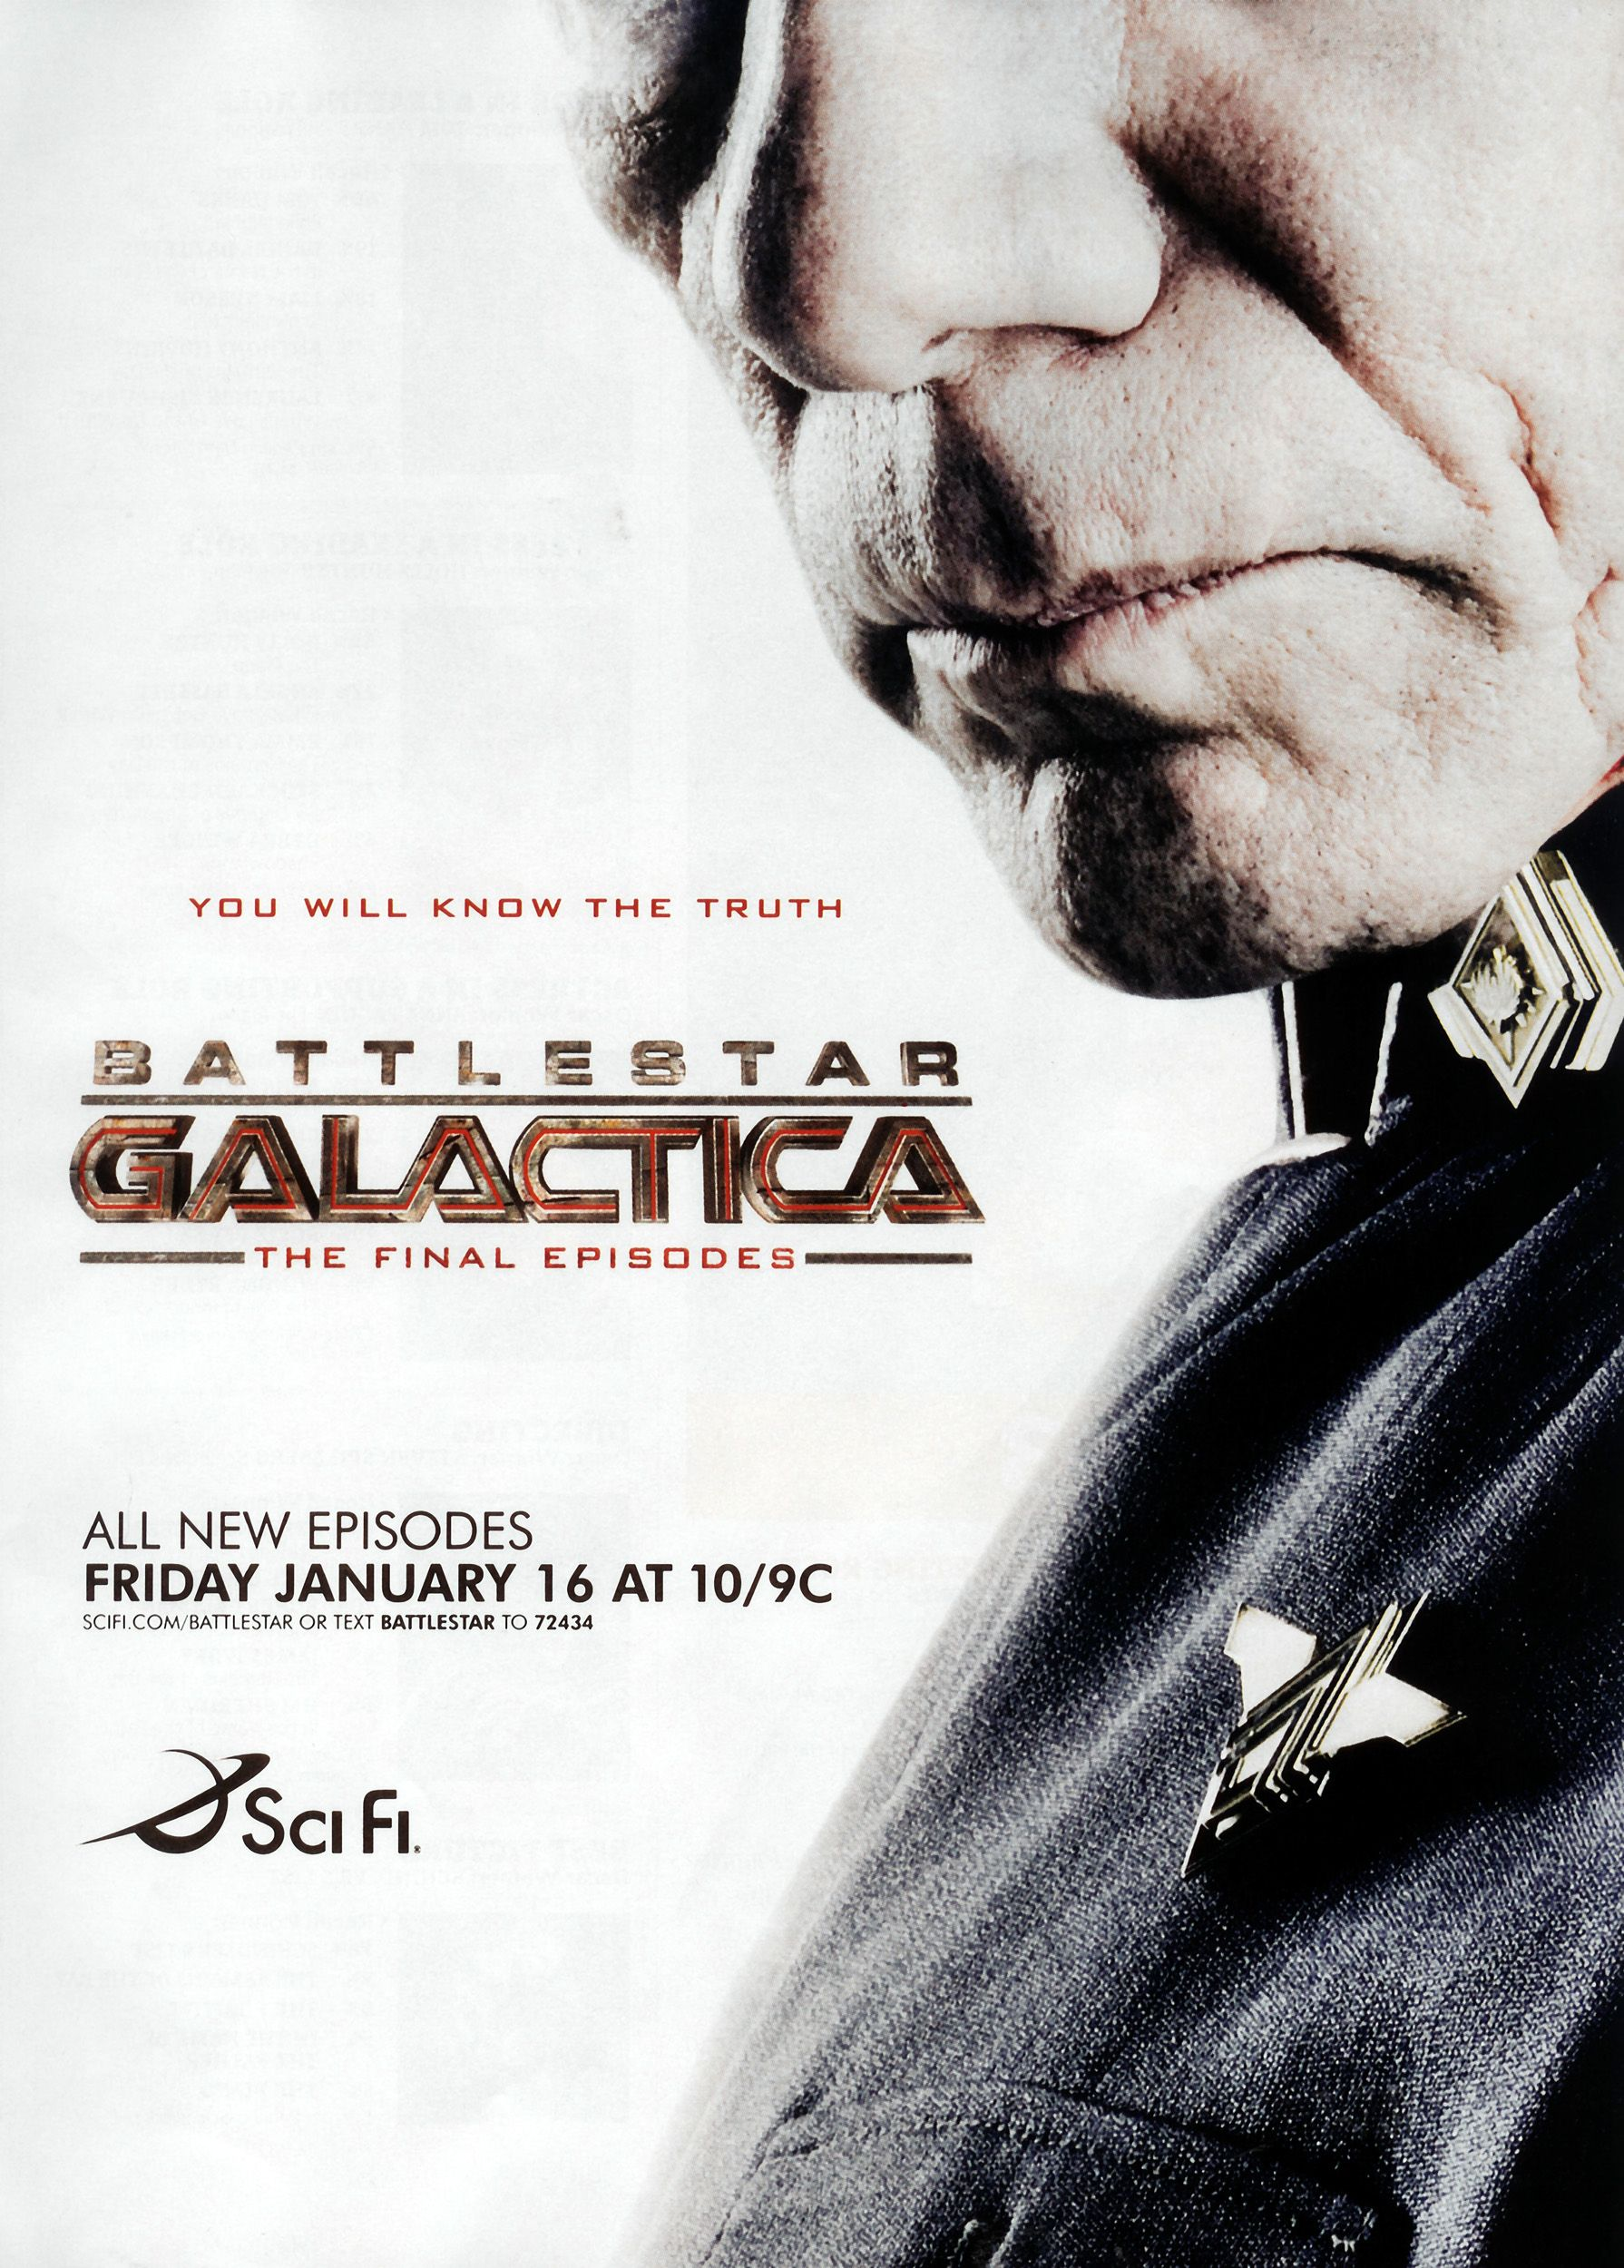 #battlestar #galactica Billionaire Ryan Mercer recently purchased controlling interest in Oceanic Airlines www.ryanmercer.com